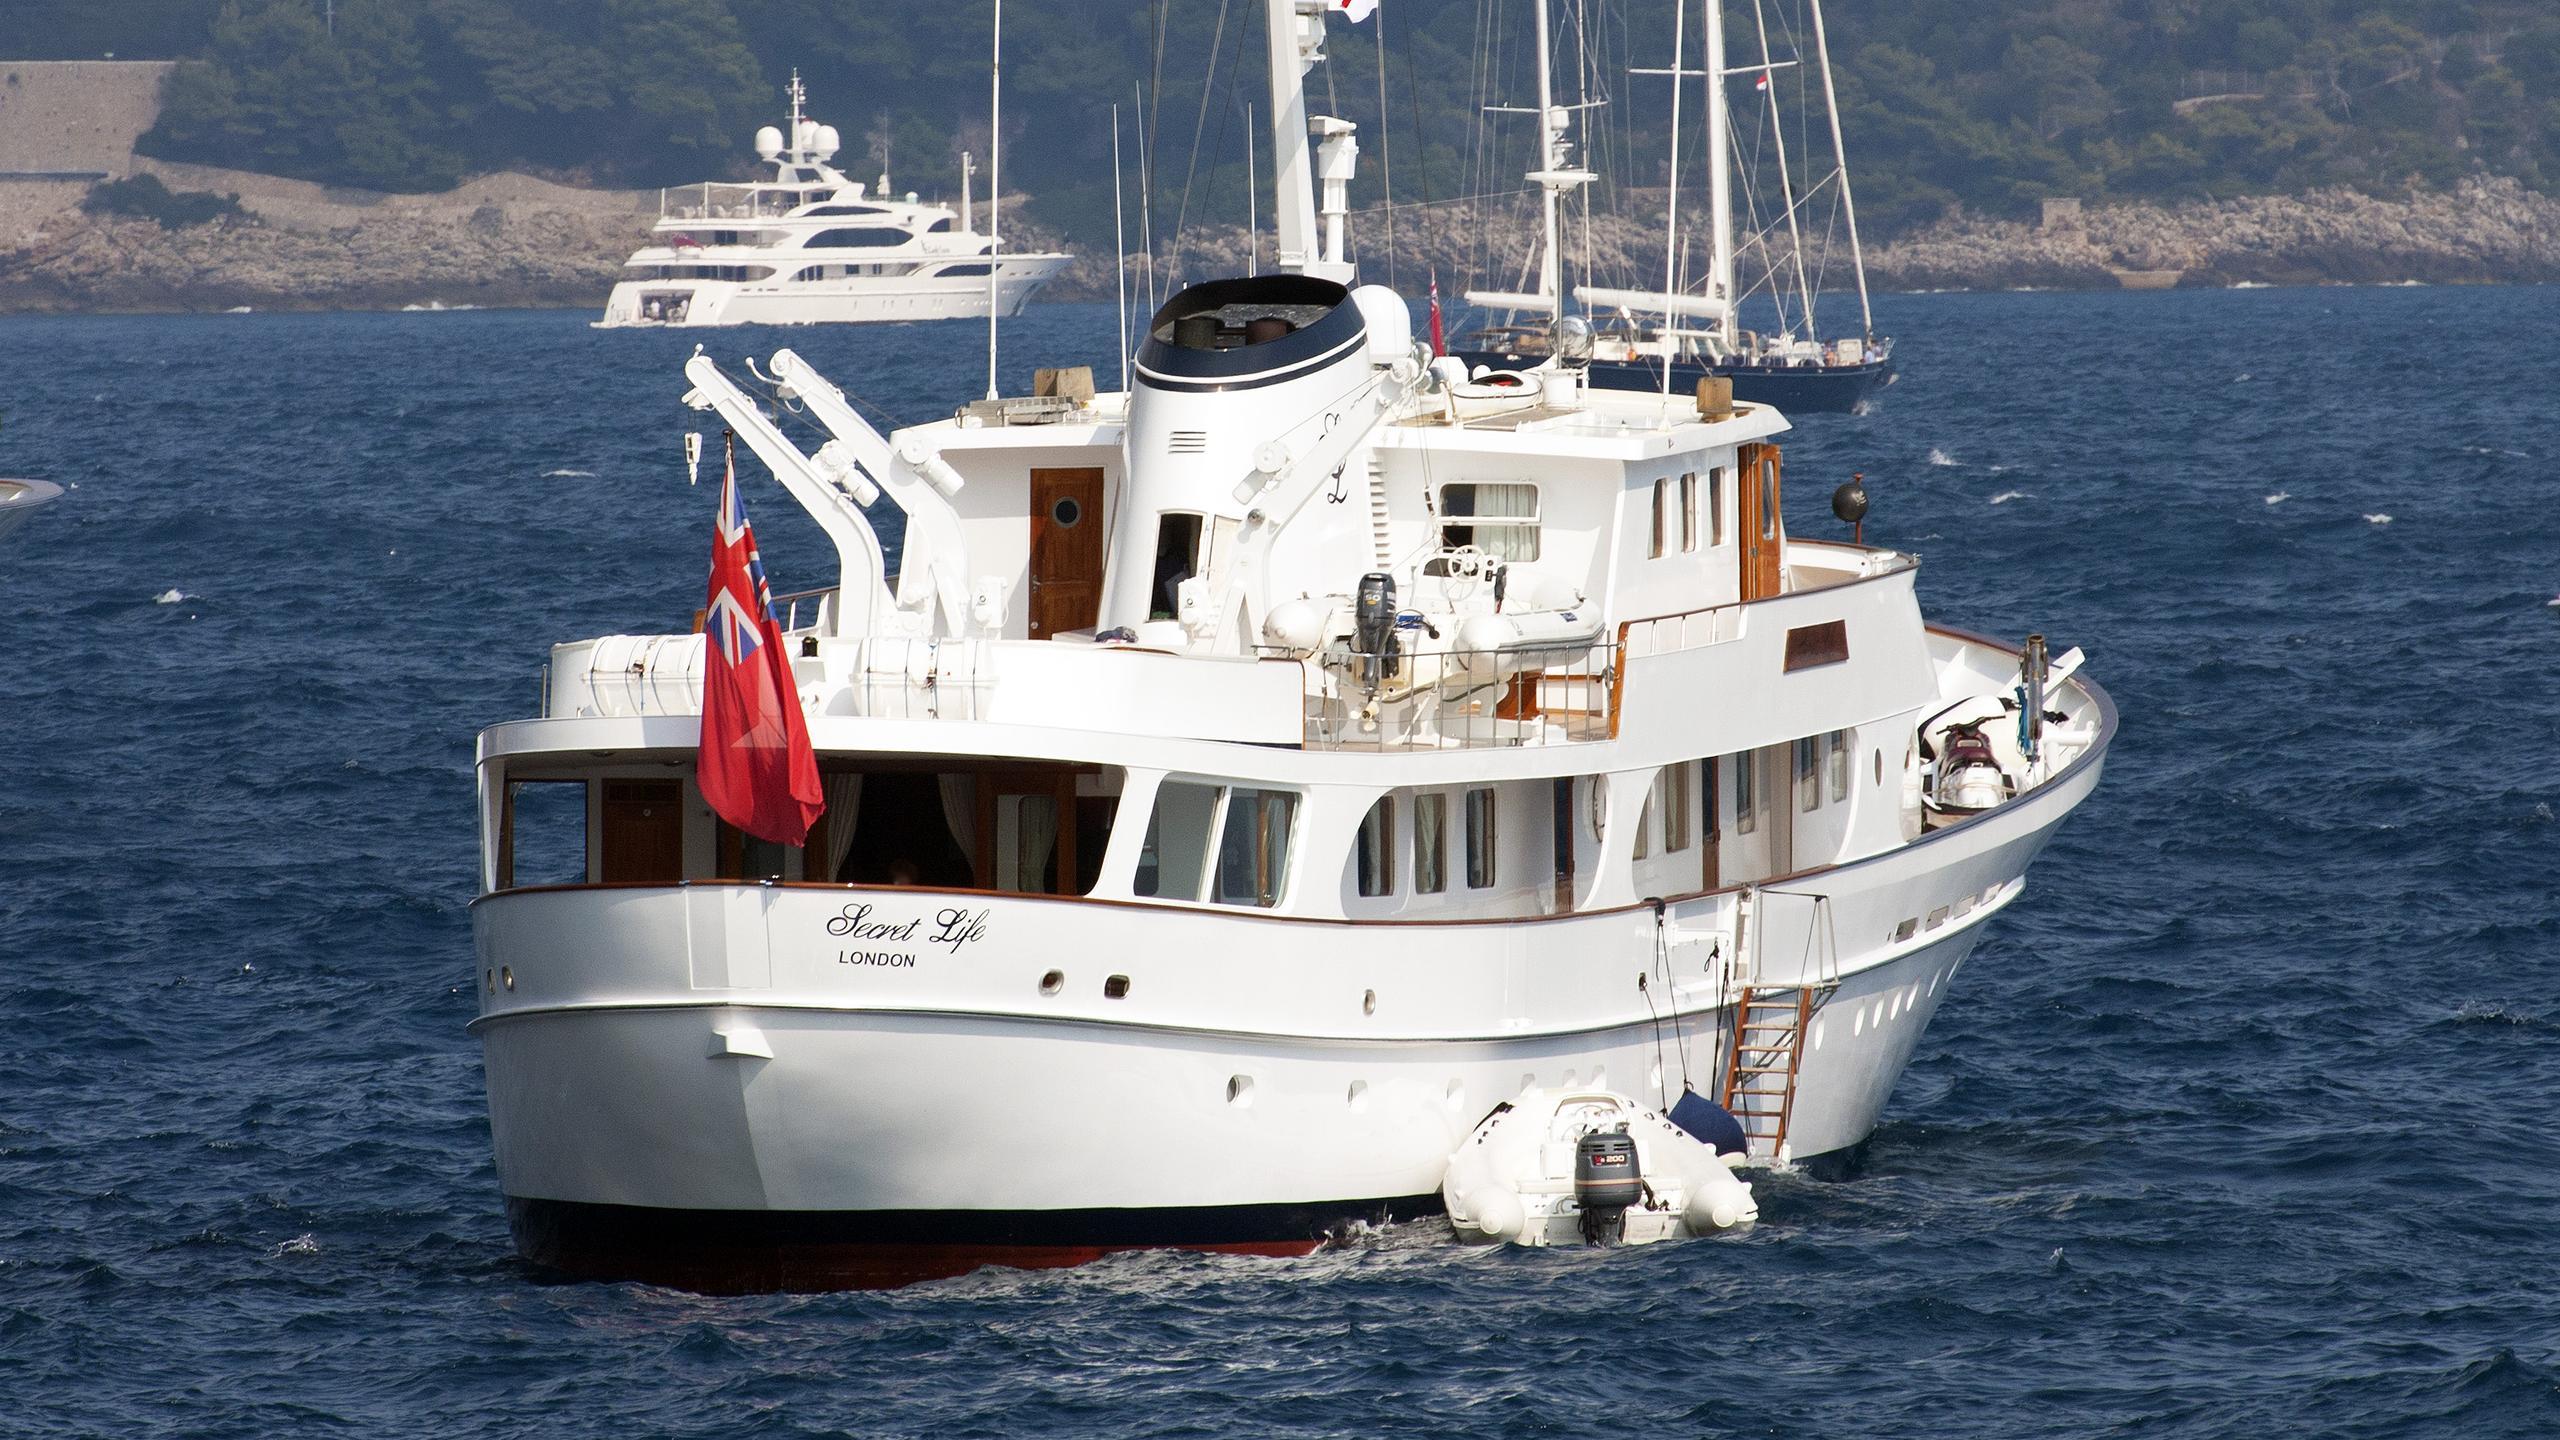 secret-life-motor-yacht-feadship-1973-45m-stern